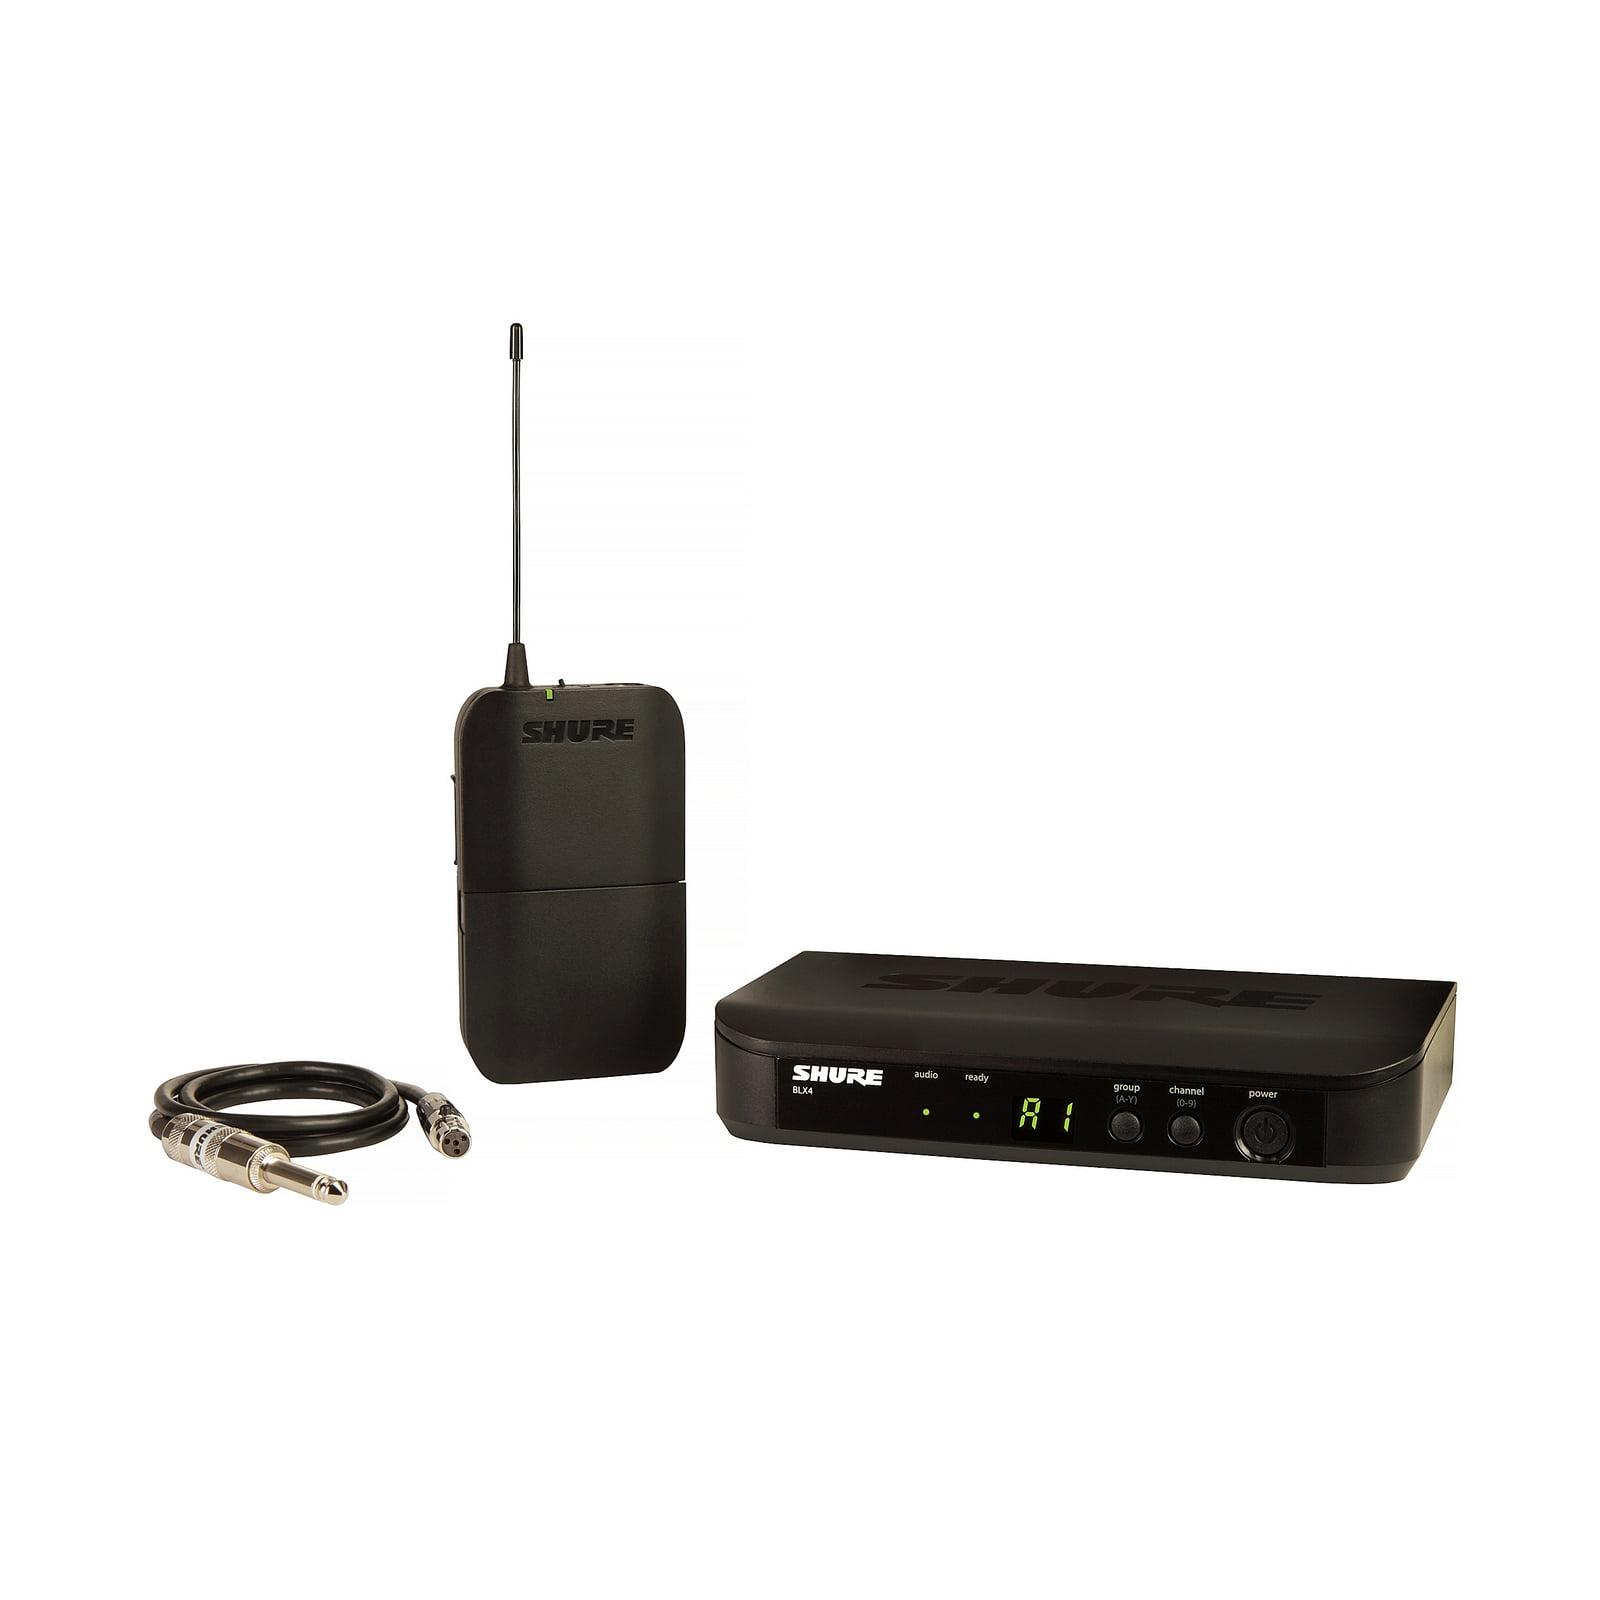 Shure BLX14 H10 | WA302 Bodypack Instrument Wireless System by